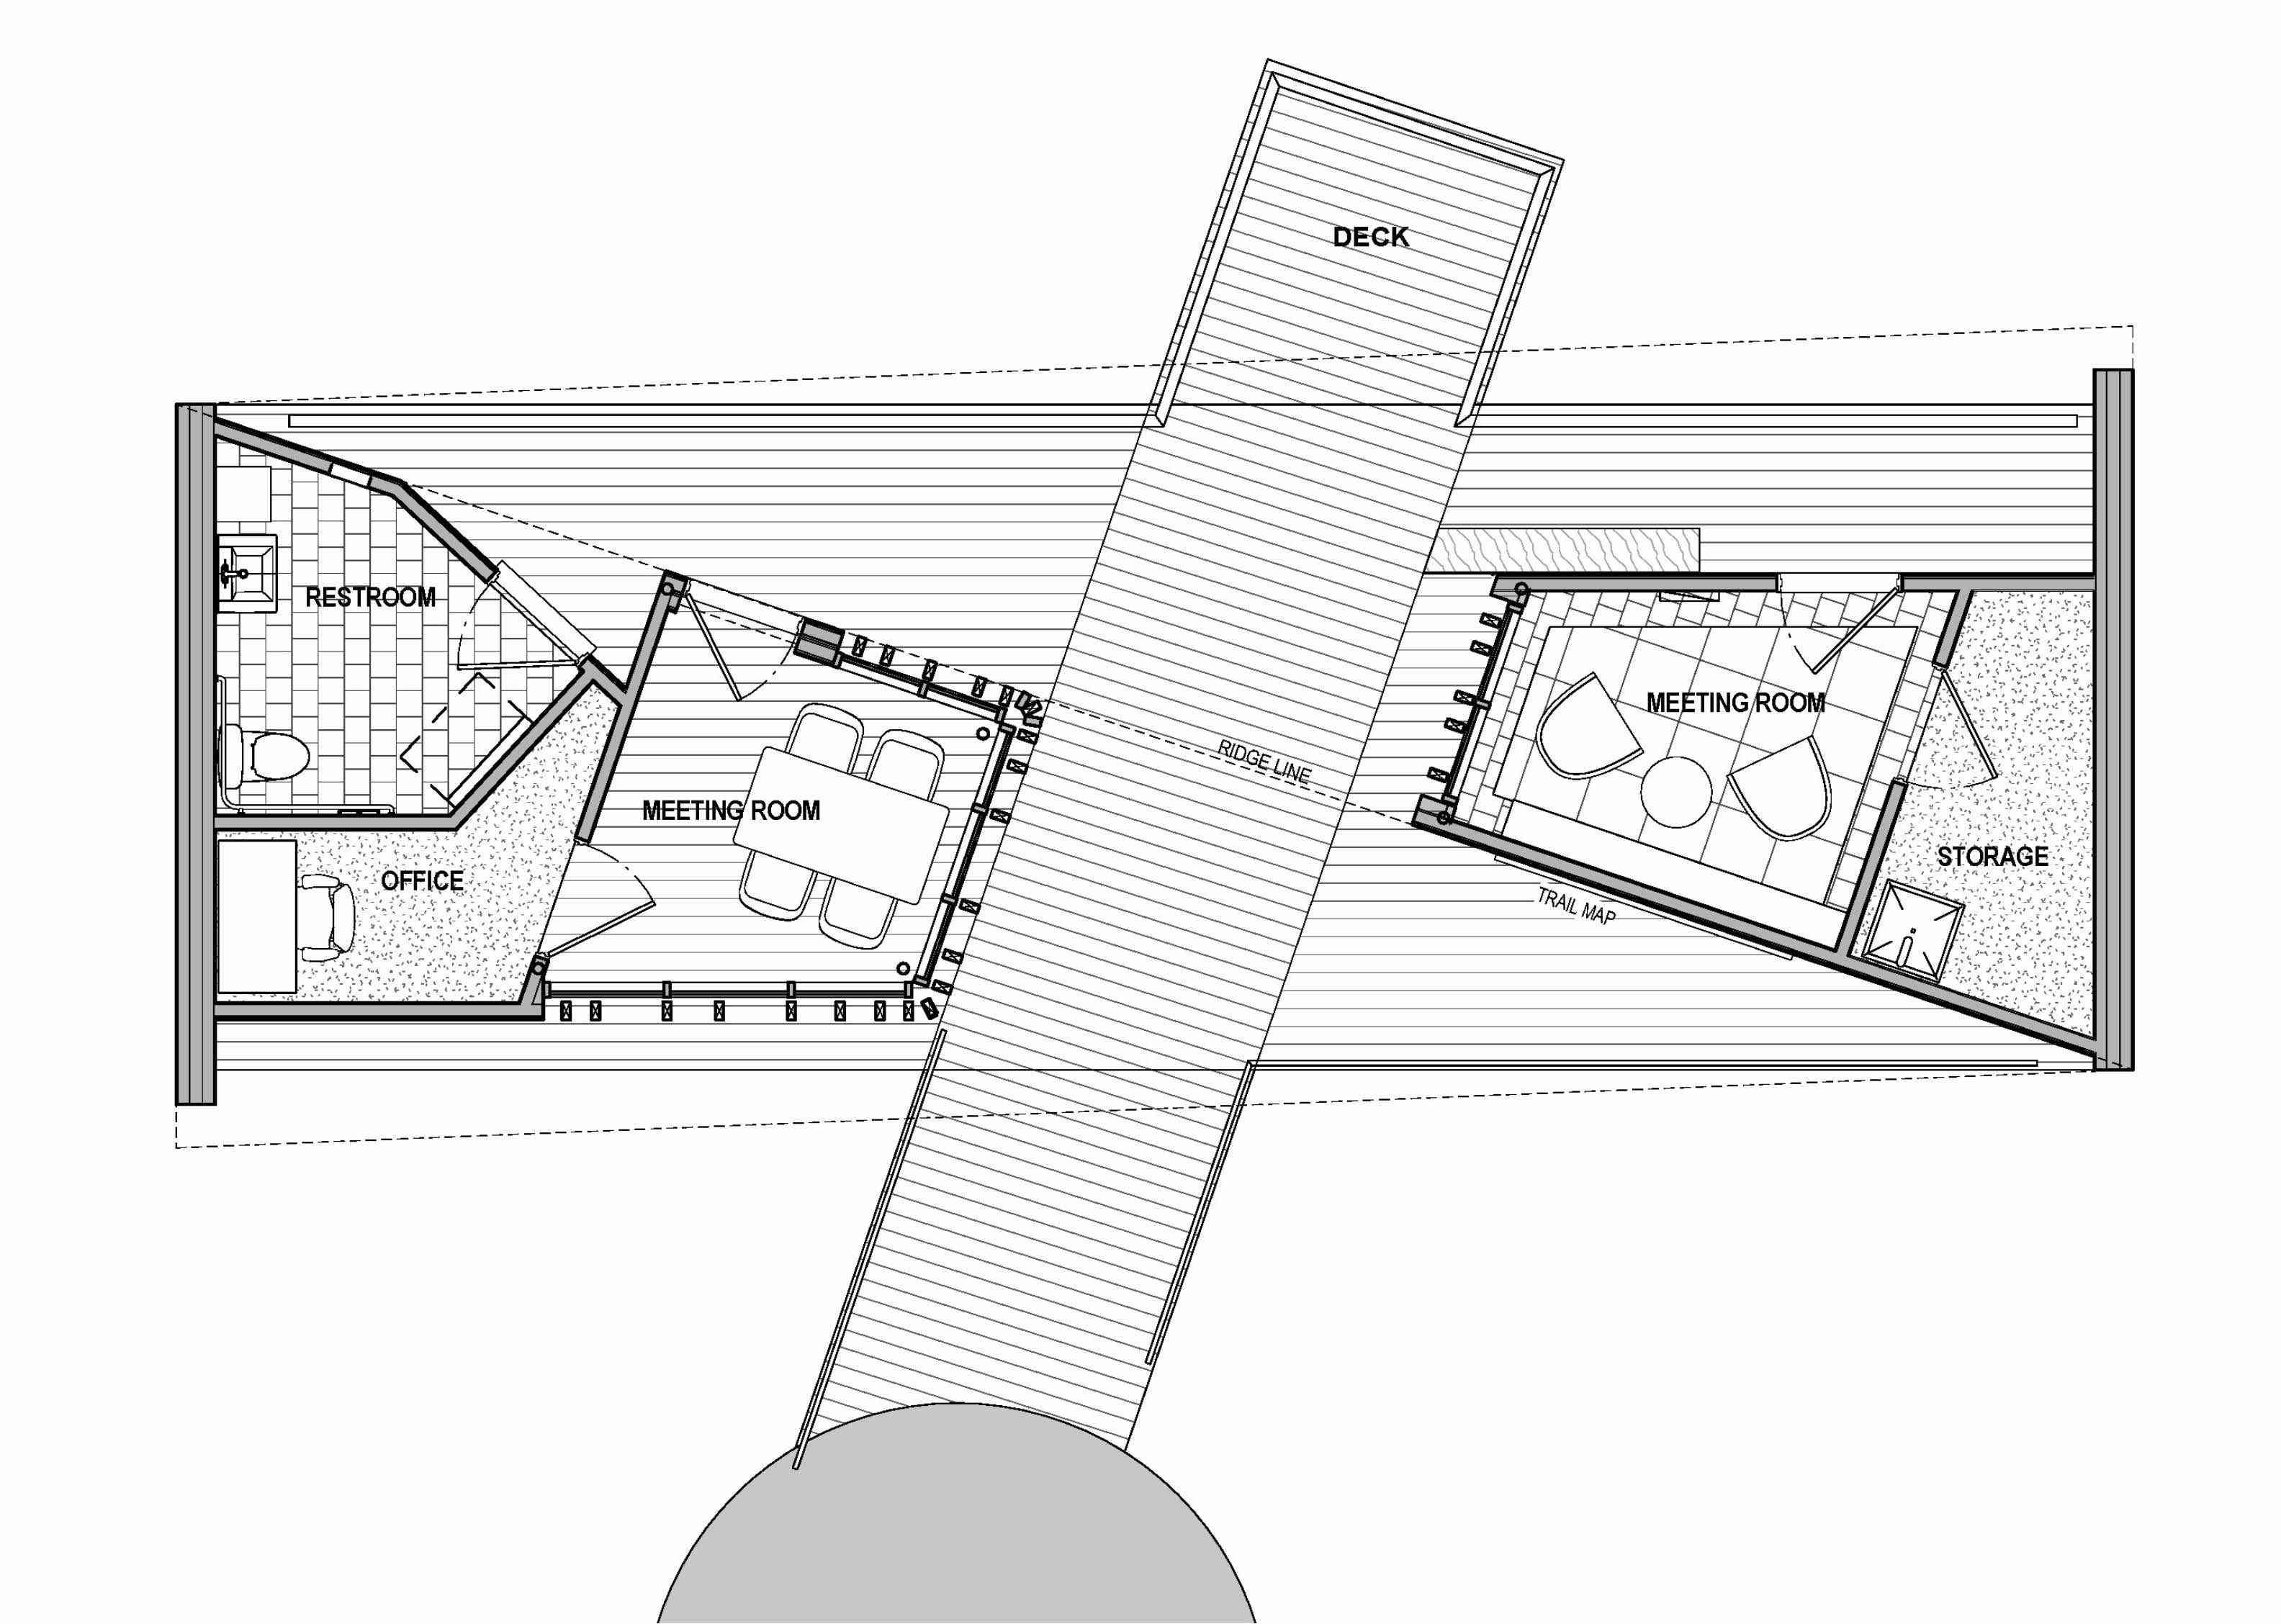 Plan of building